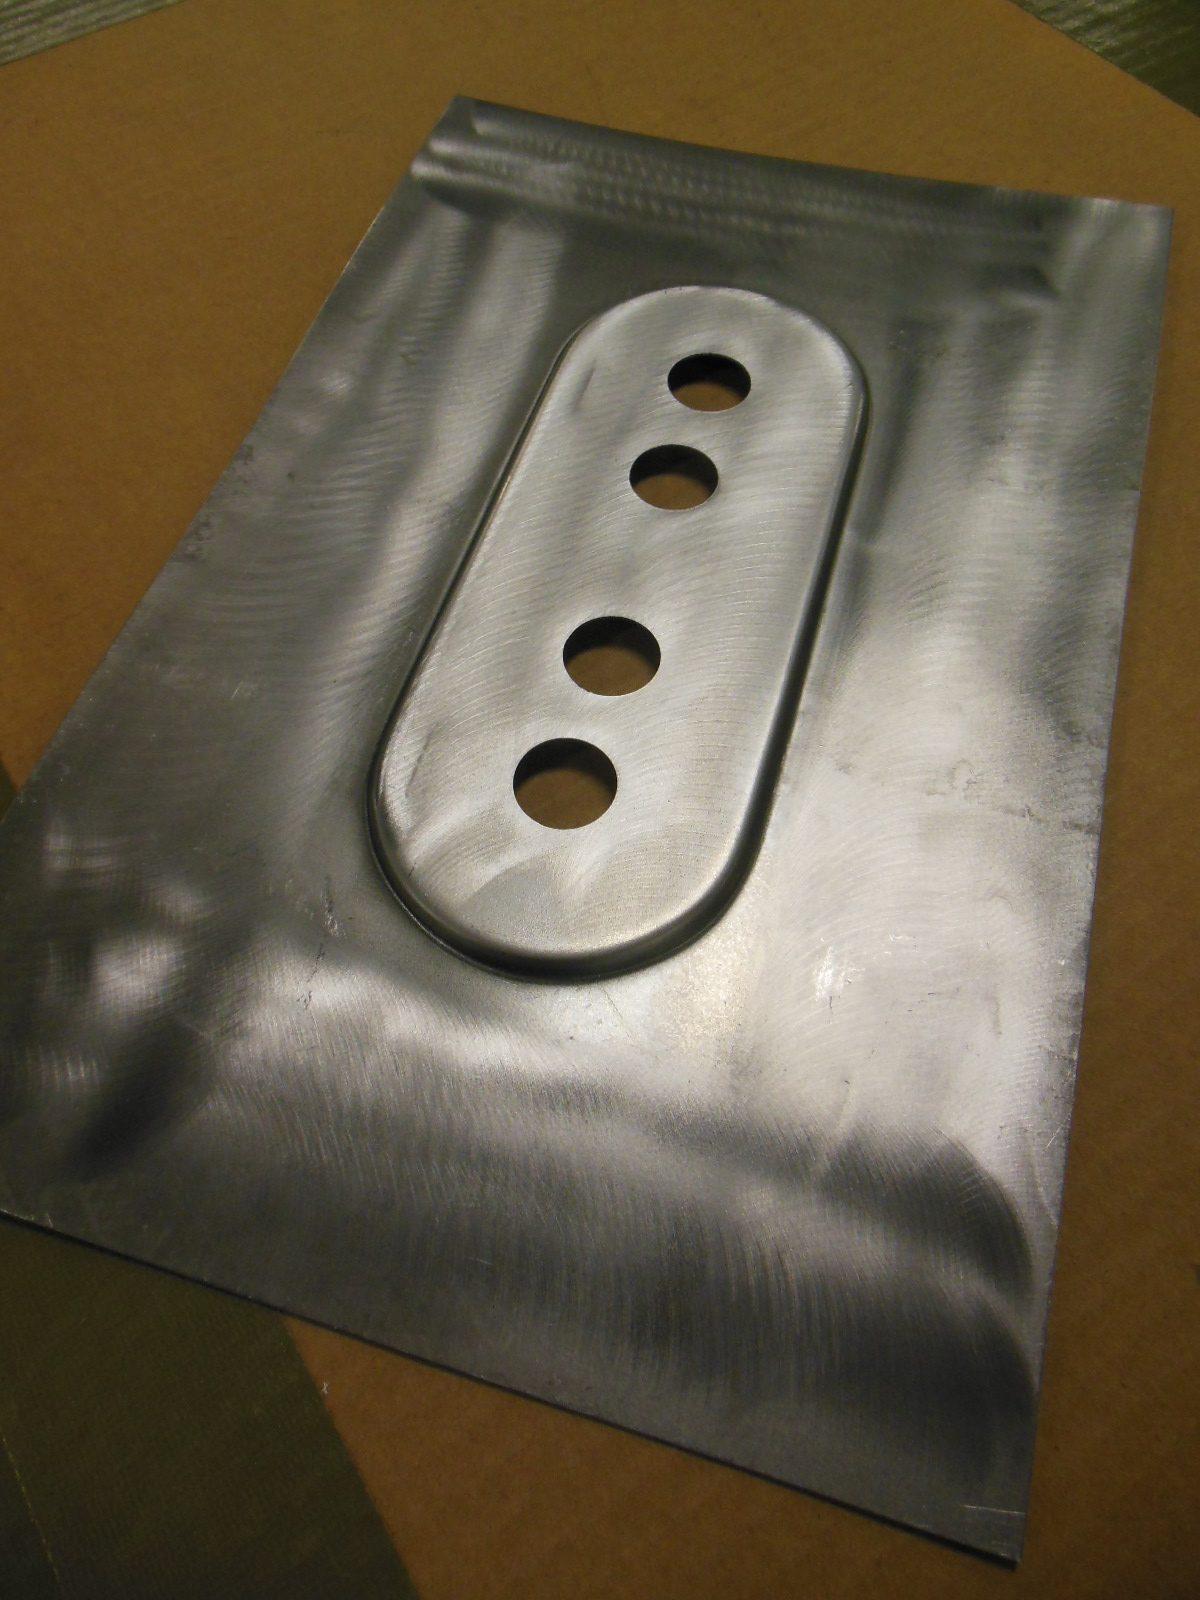 RestoMod Air Bulkhead - Diablo - 18ga. sheetmetal panel